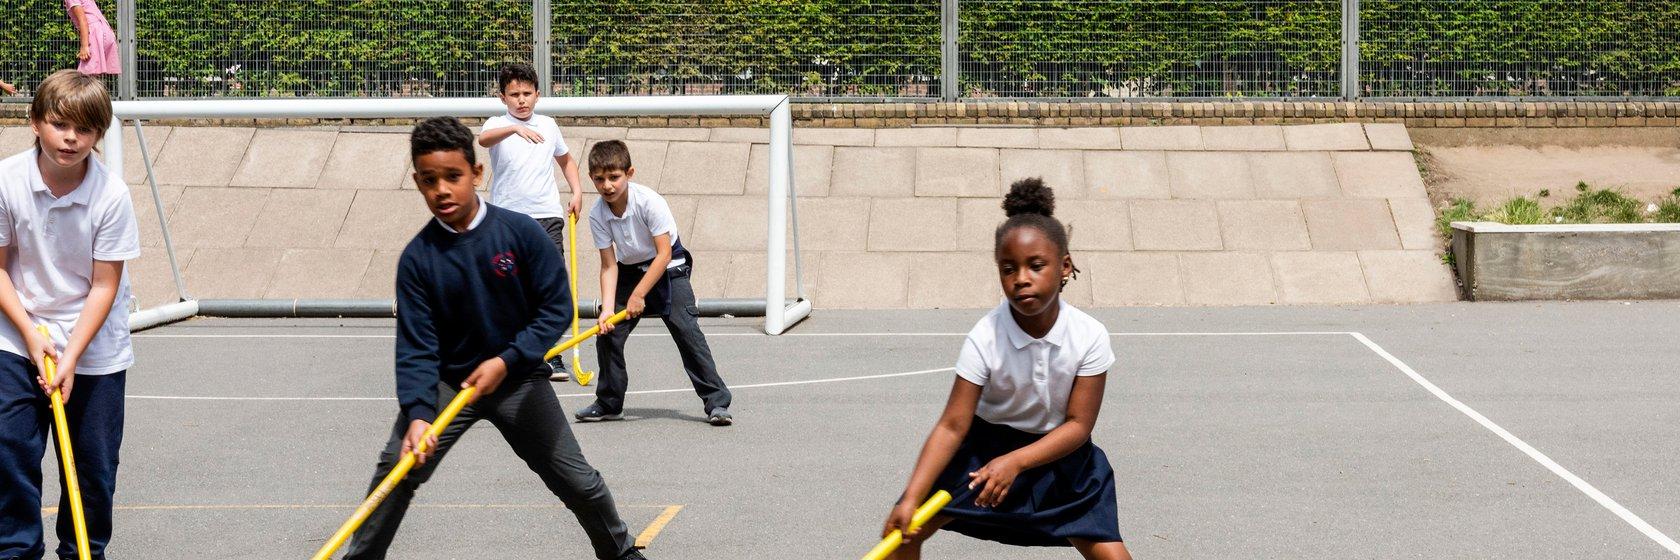 Randal Cremer_children playing hockey